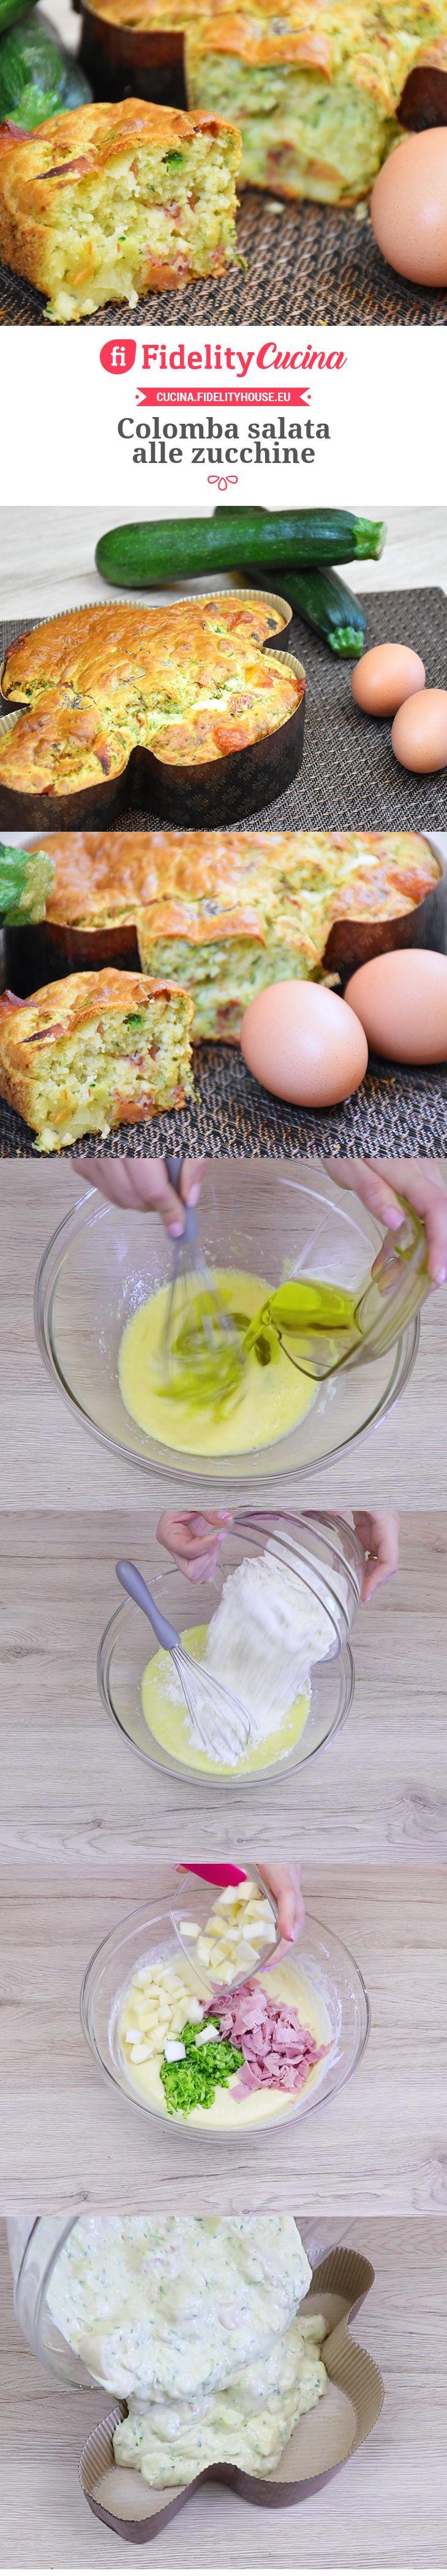 Colomba salata alle zucchine